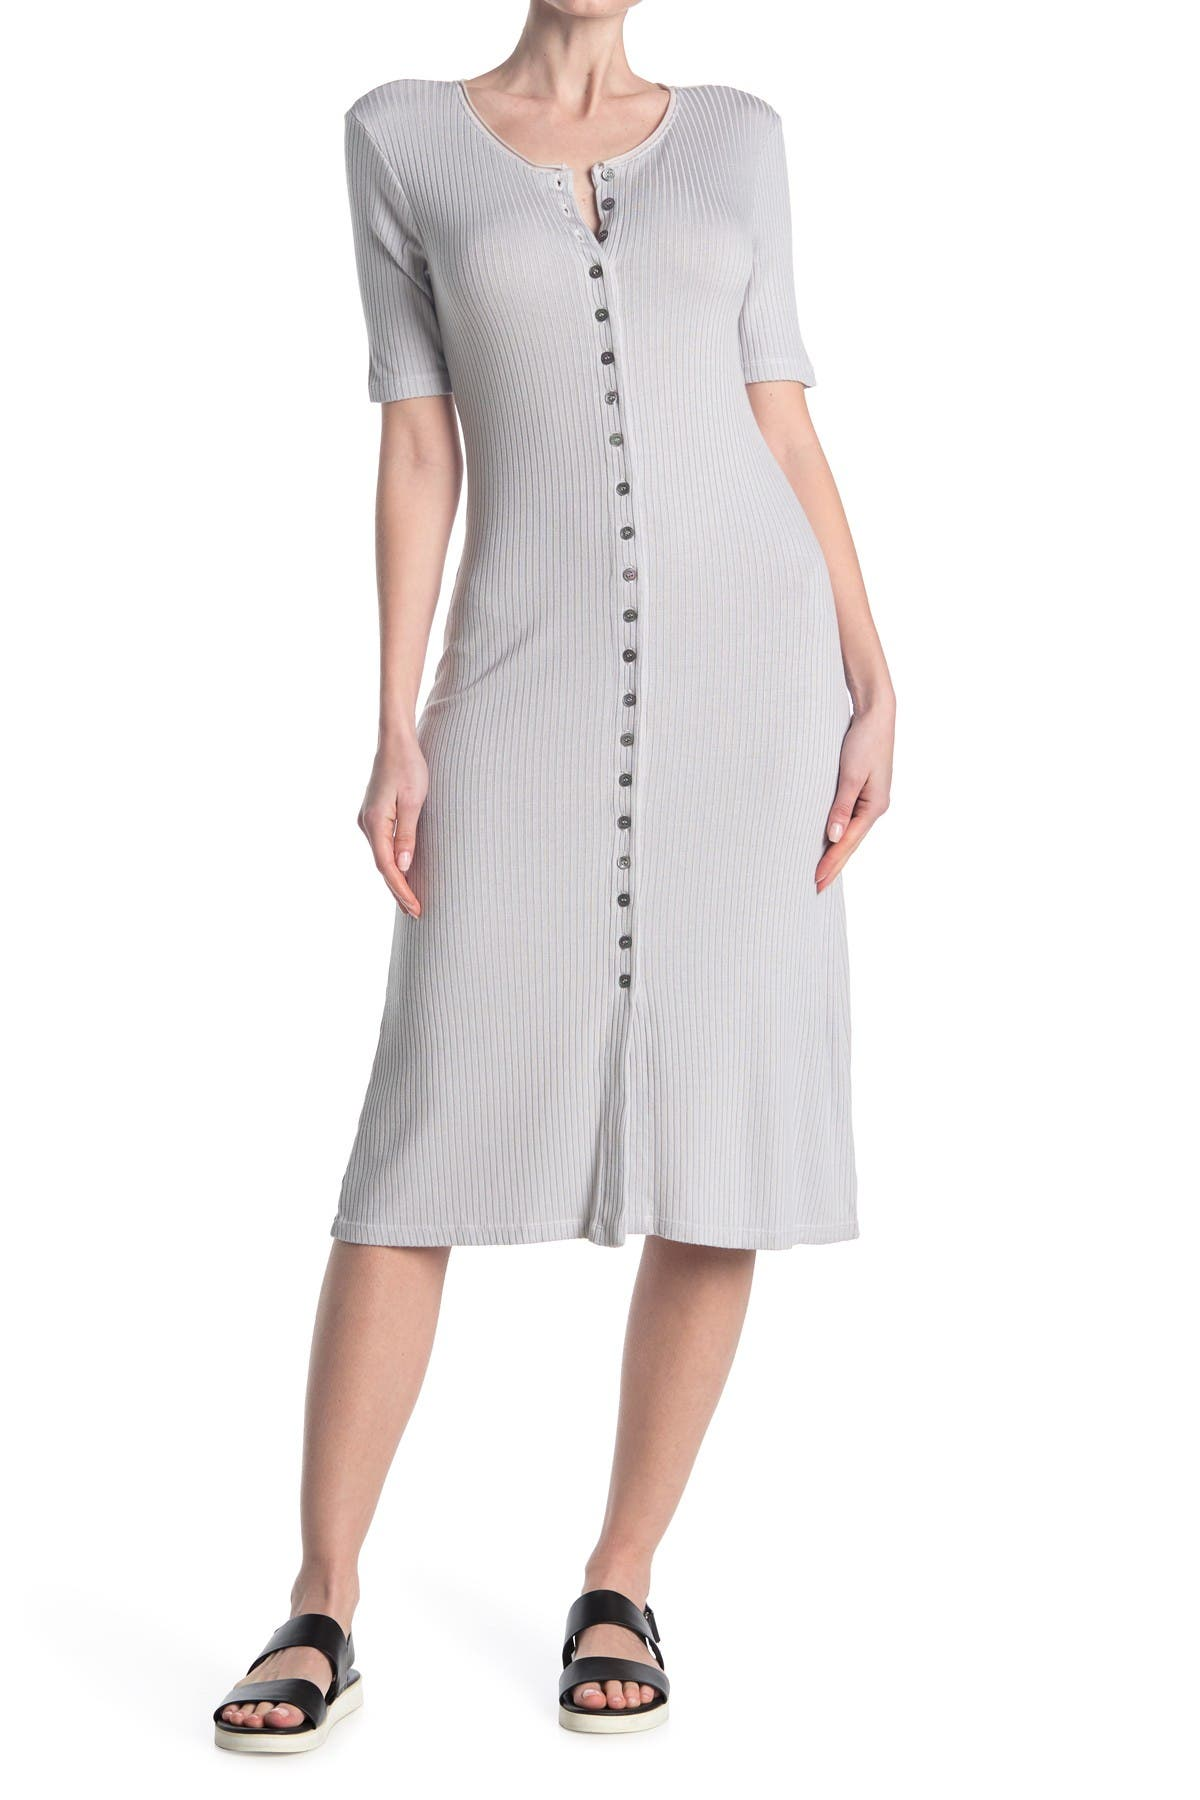 Image of Stateside Rib Maxi Button Up Dress